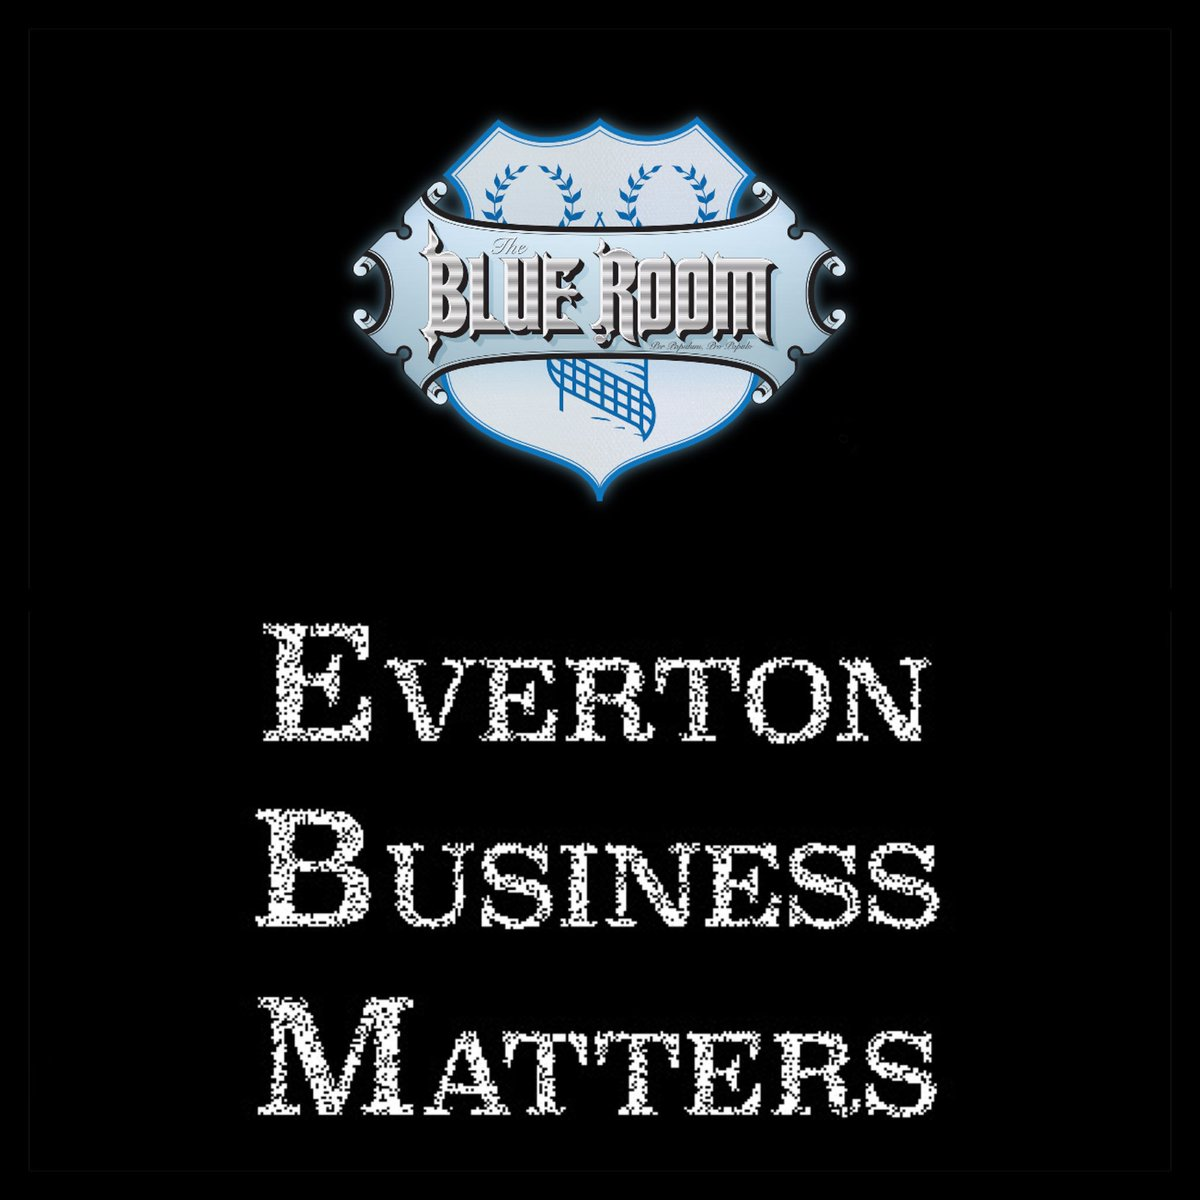 As it&#39;s Friday....   #EvertonBusinessMatters Episode 5! Right here. #EFC  http://www. theblueroomefc.com/2017/06/podcas t-everton-business-matters-episode-5/ &nbsp; … <br>http://pic.twitter.com/Vwj7s94gQa